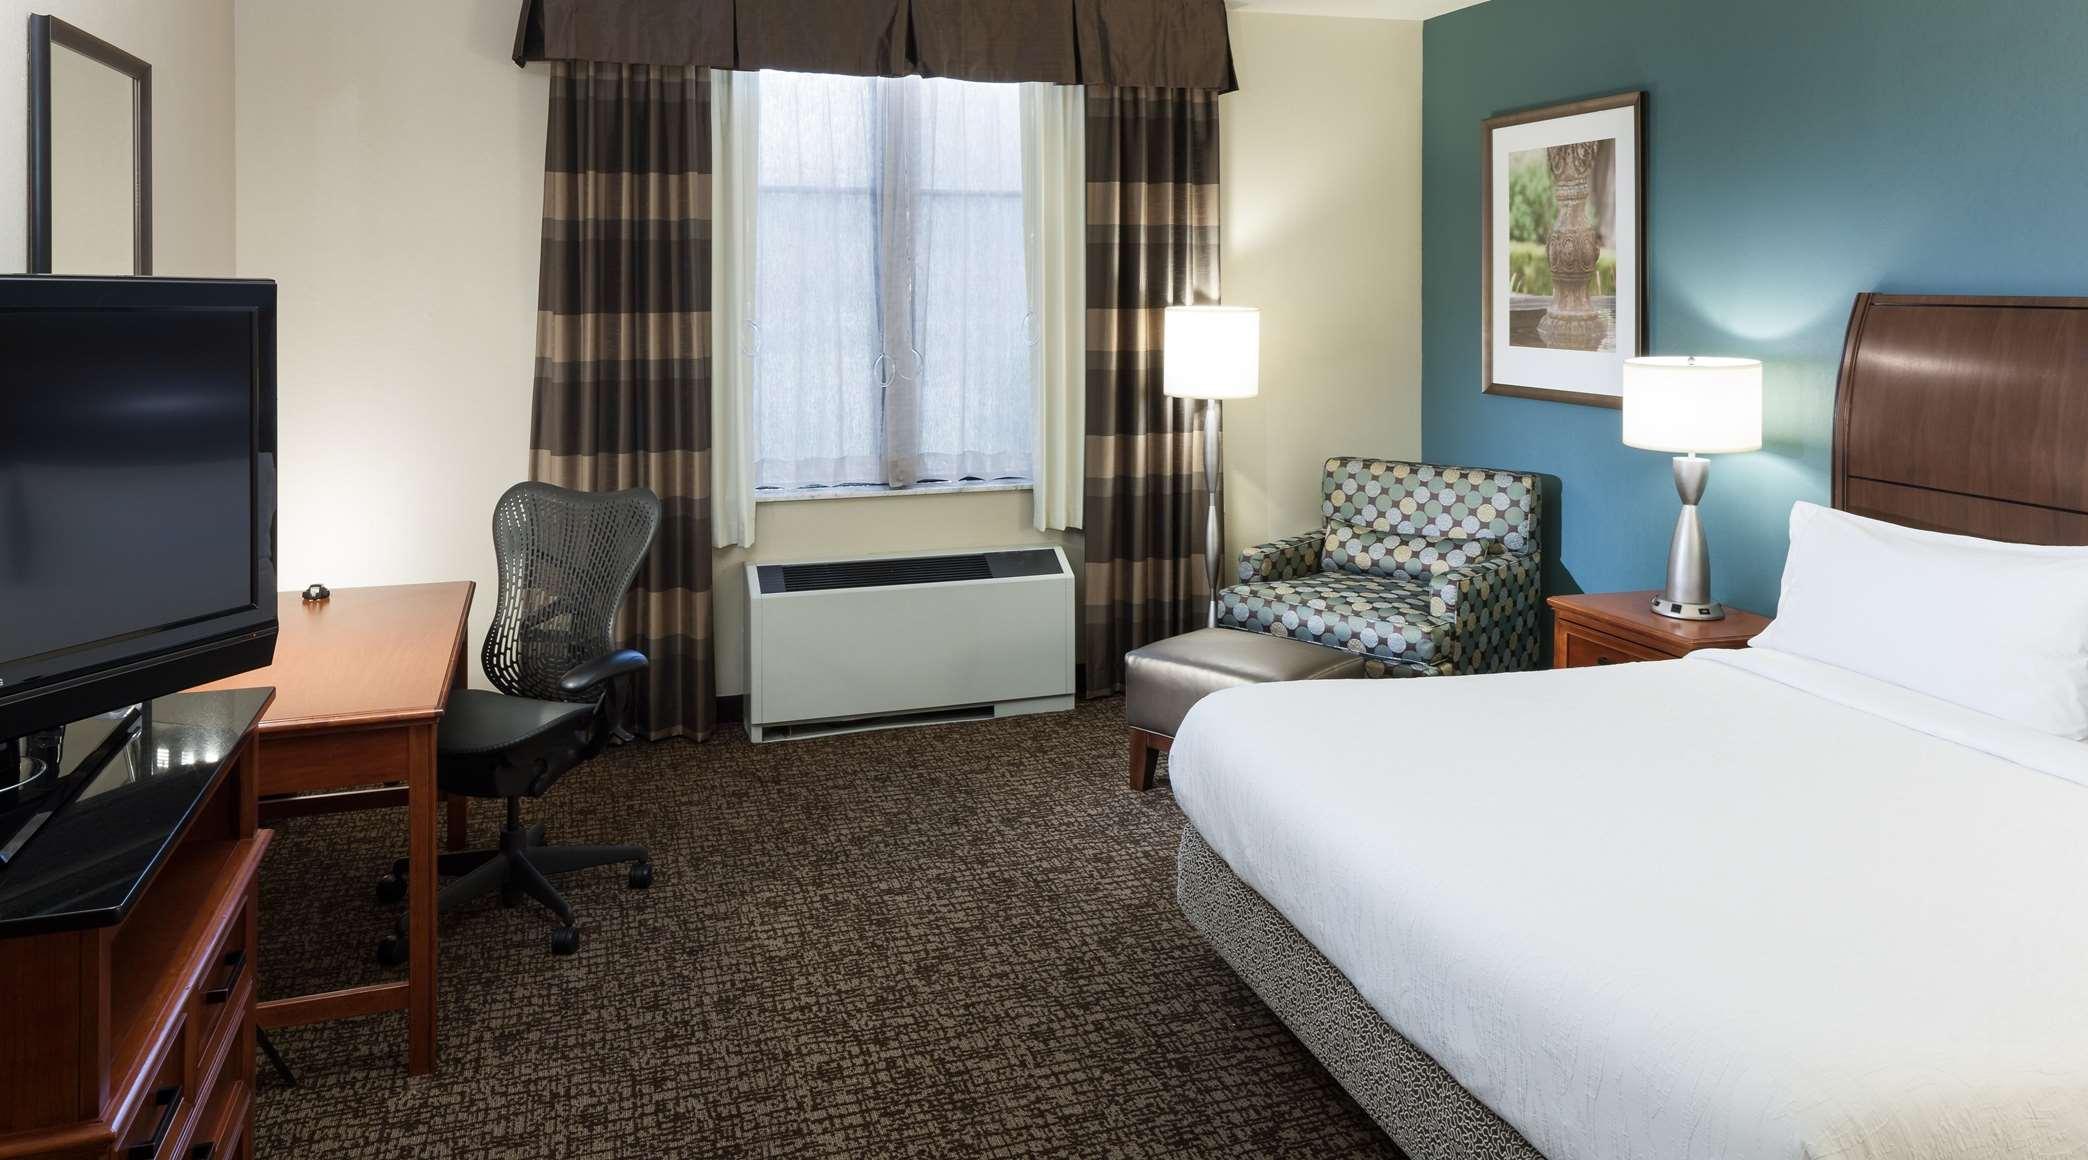 Hilton Garden Inn Rockaway image 12